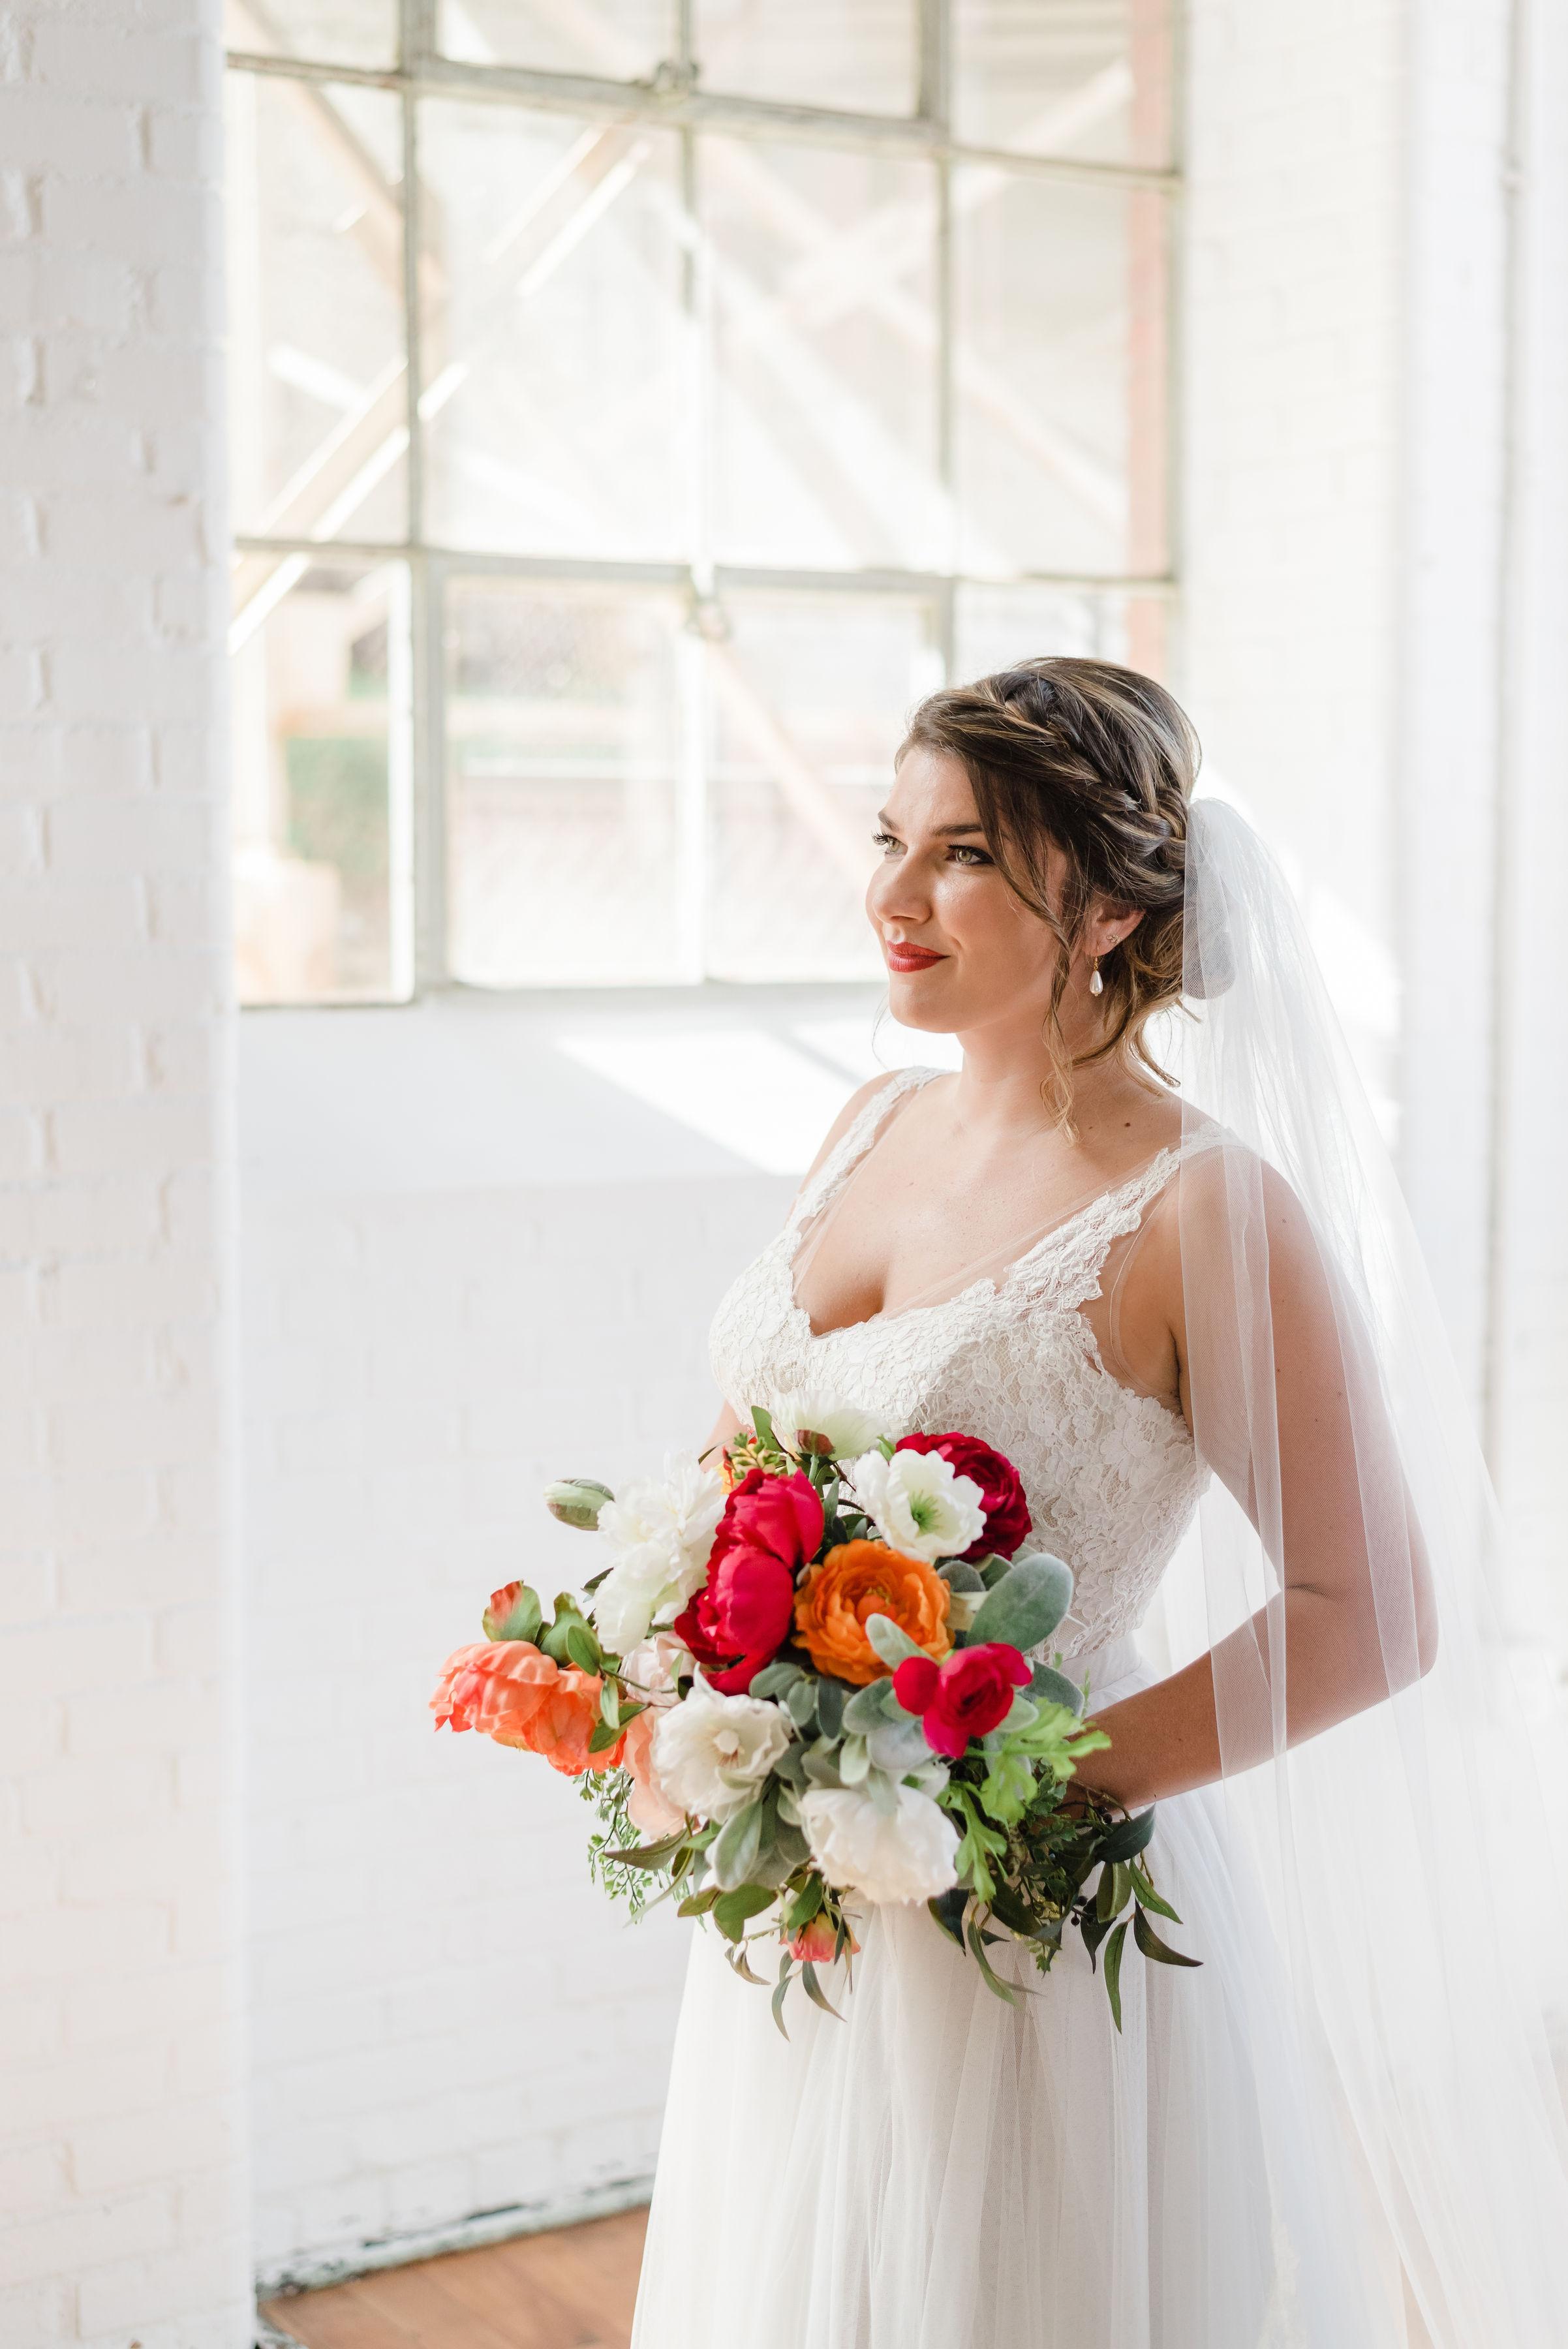 TaylorAdams_bridals-69.jpg